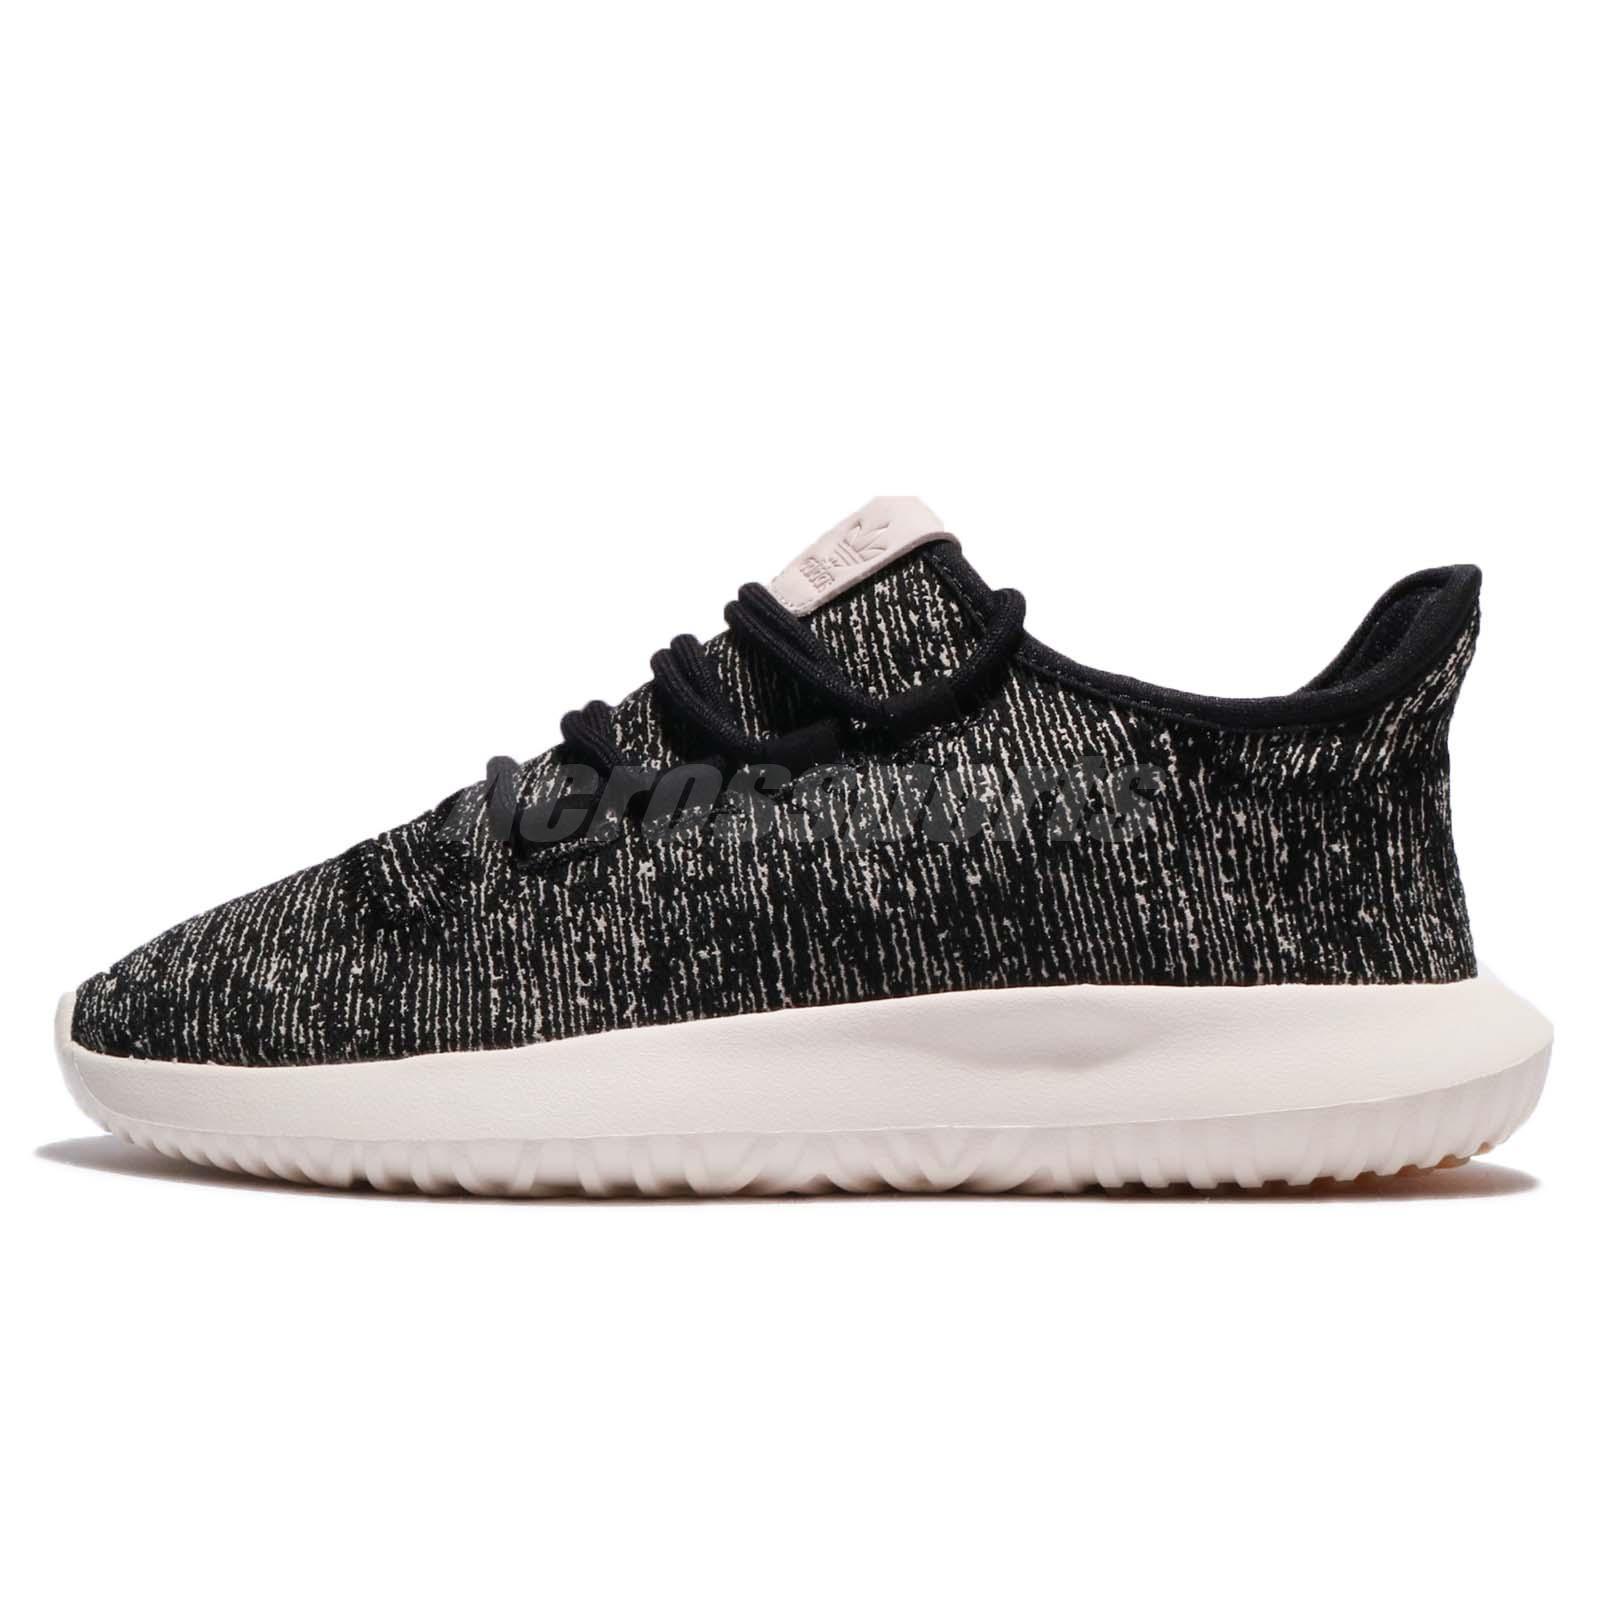 adidas Originals Tubular Shadow W Brown Black Women Running Shoes BB6370 f01b81b56